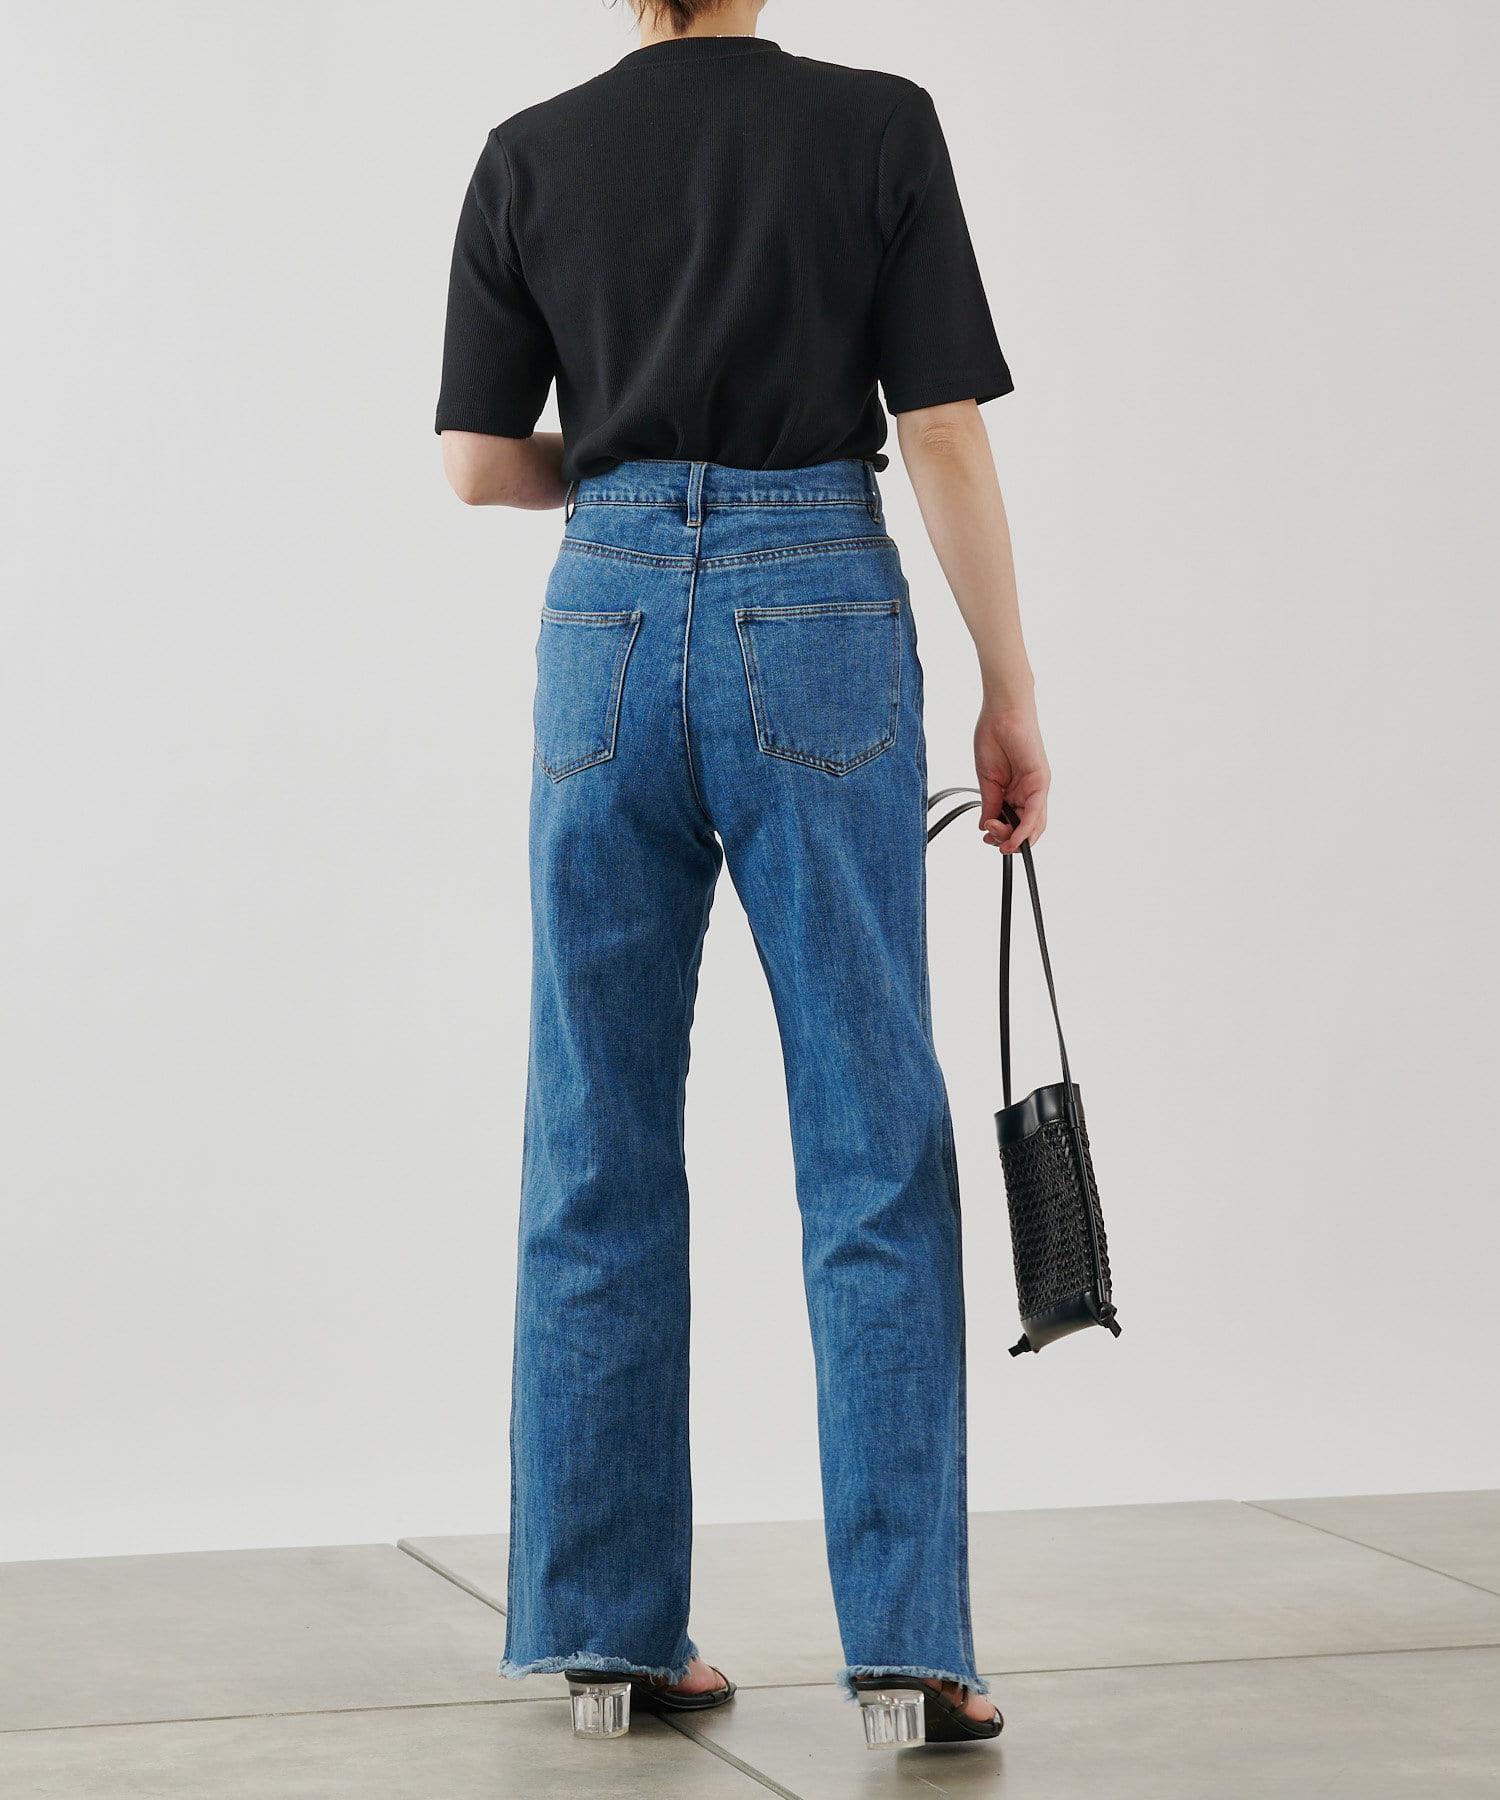 COLONY 2139(コロニー トゥーワンスリーナイン) ギザコットンリブ5分袖Tシャツ